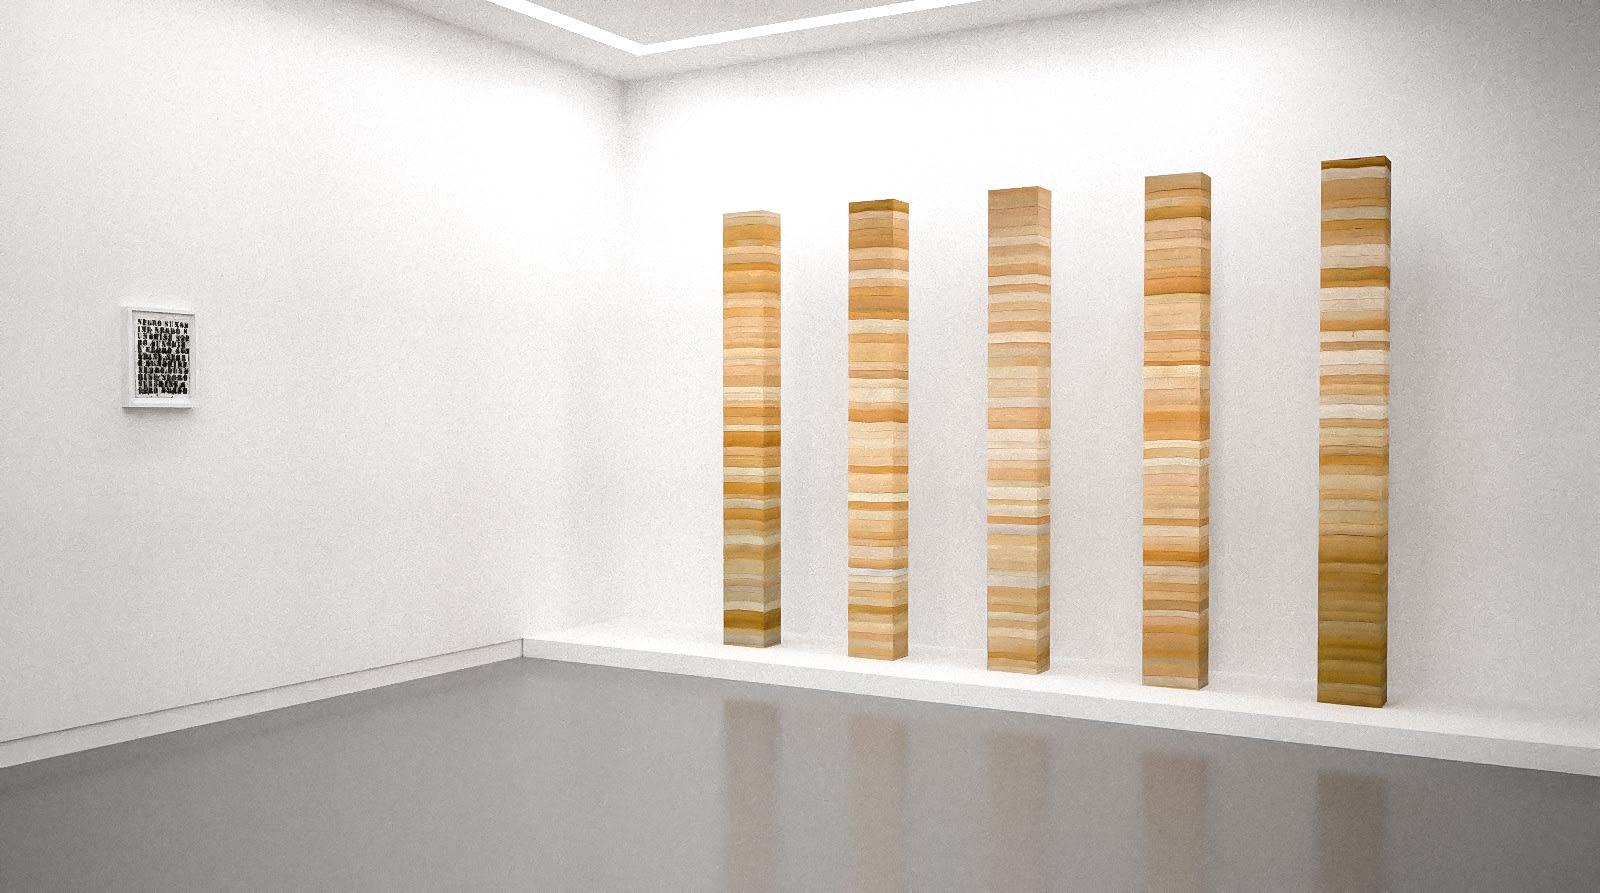 Glenn Ligon and Manish Nai in The Written Word (virtual exhibition view), 2020, Kavi Gupta